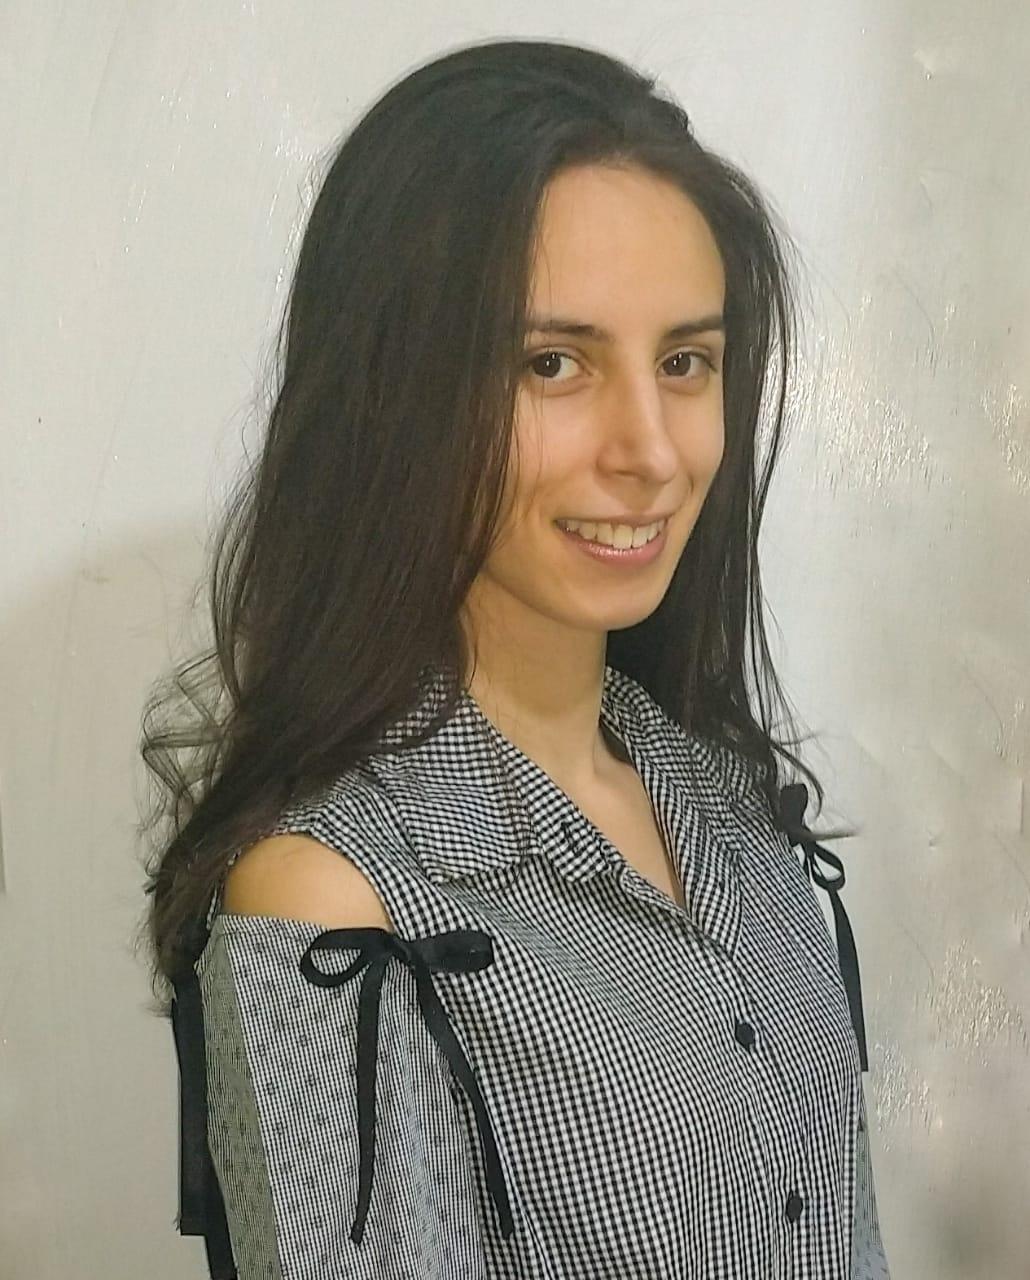 Ana Leticia Rodriguez-Barroso